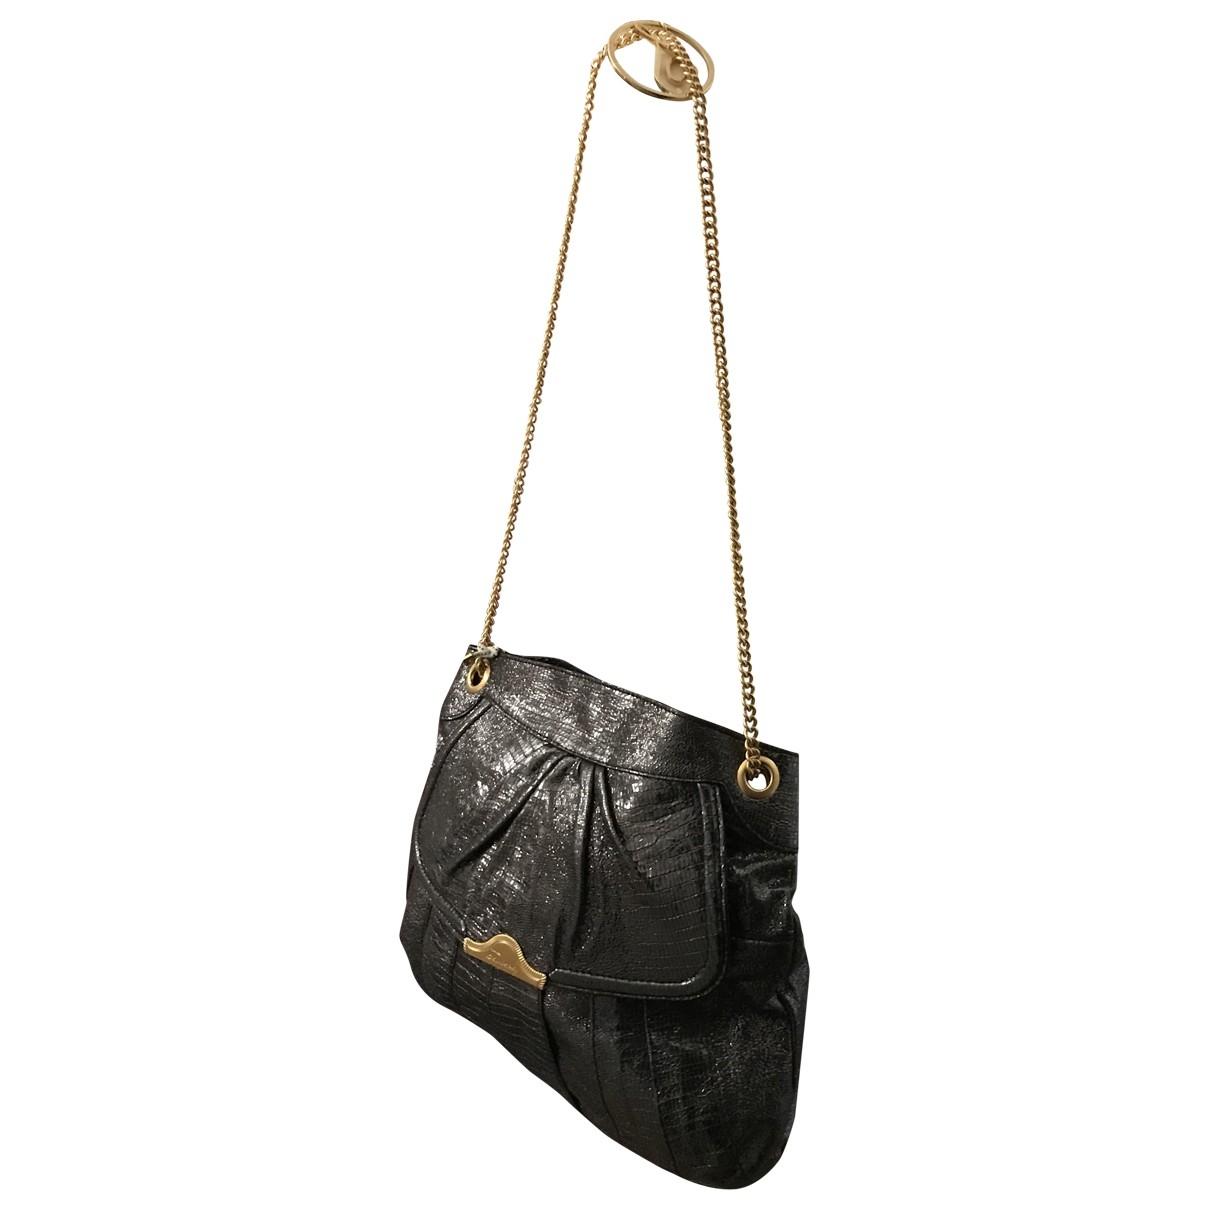 Temperley London \N Metallic Leather handbag for Women \N